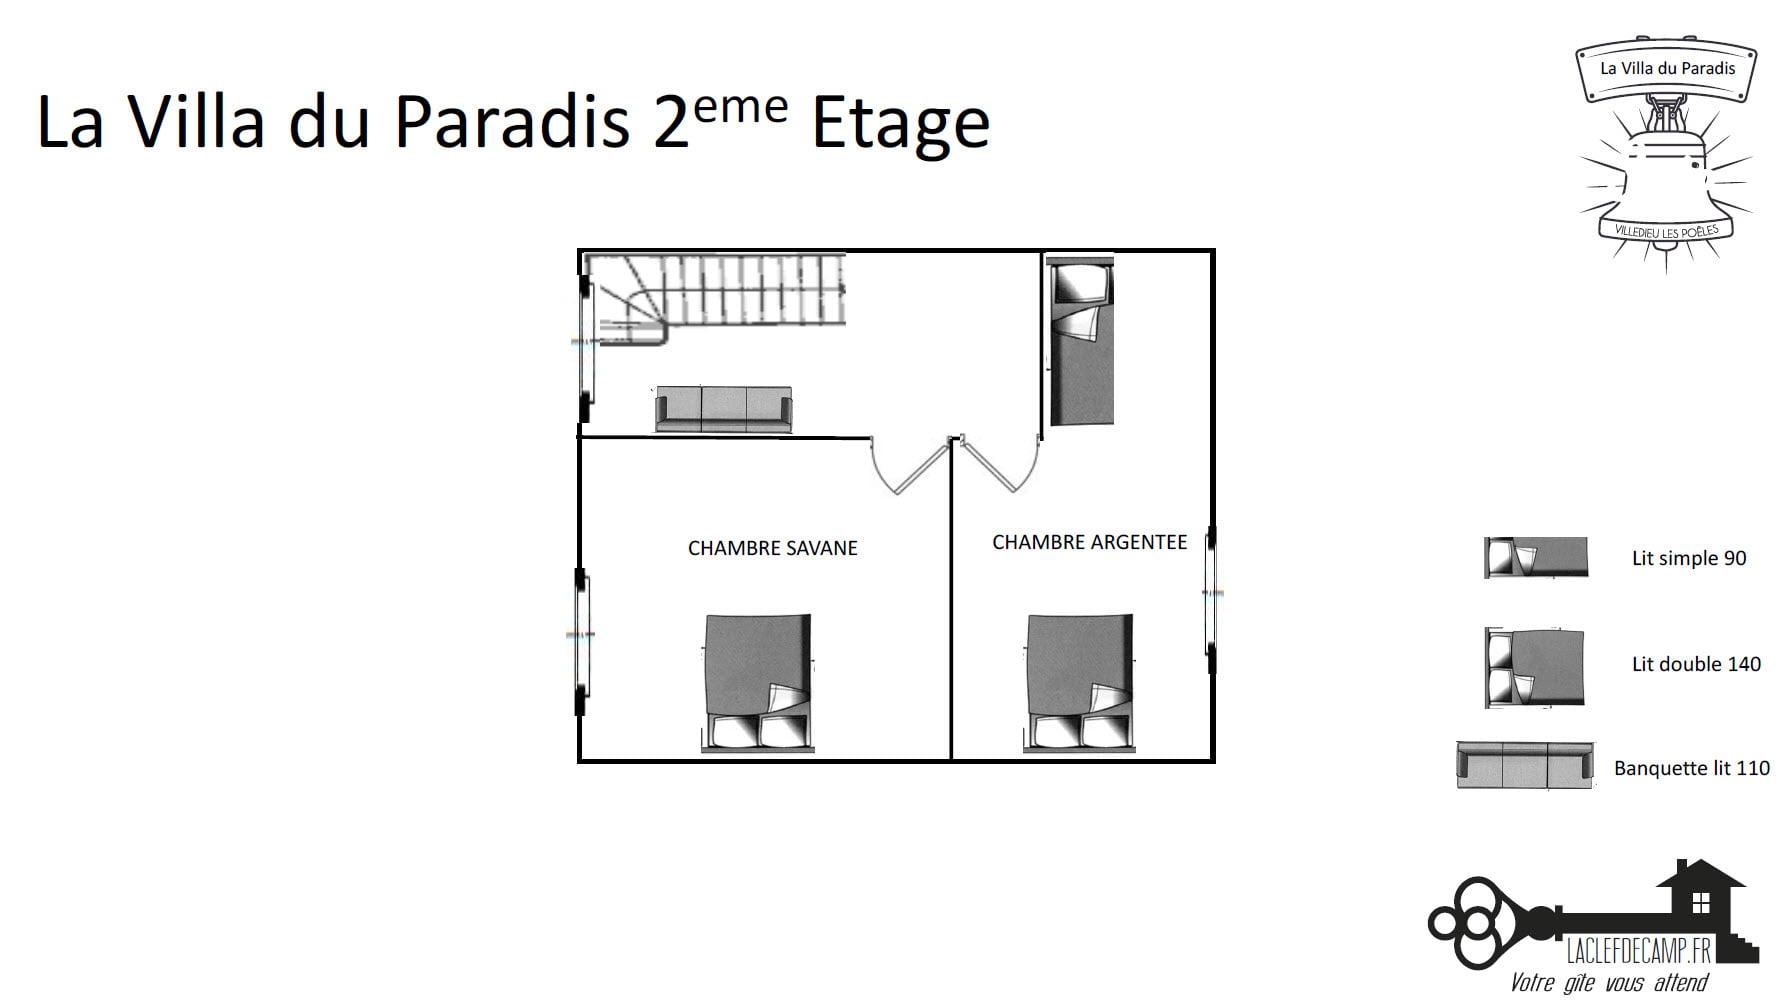 La Villa Du Paradis Villa du paradis 2eme